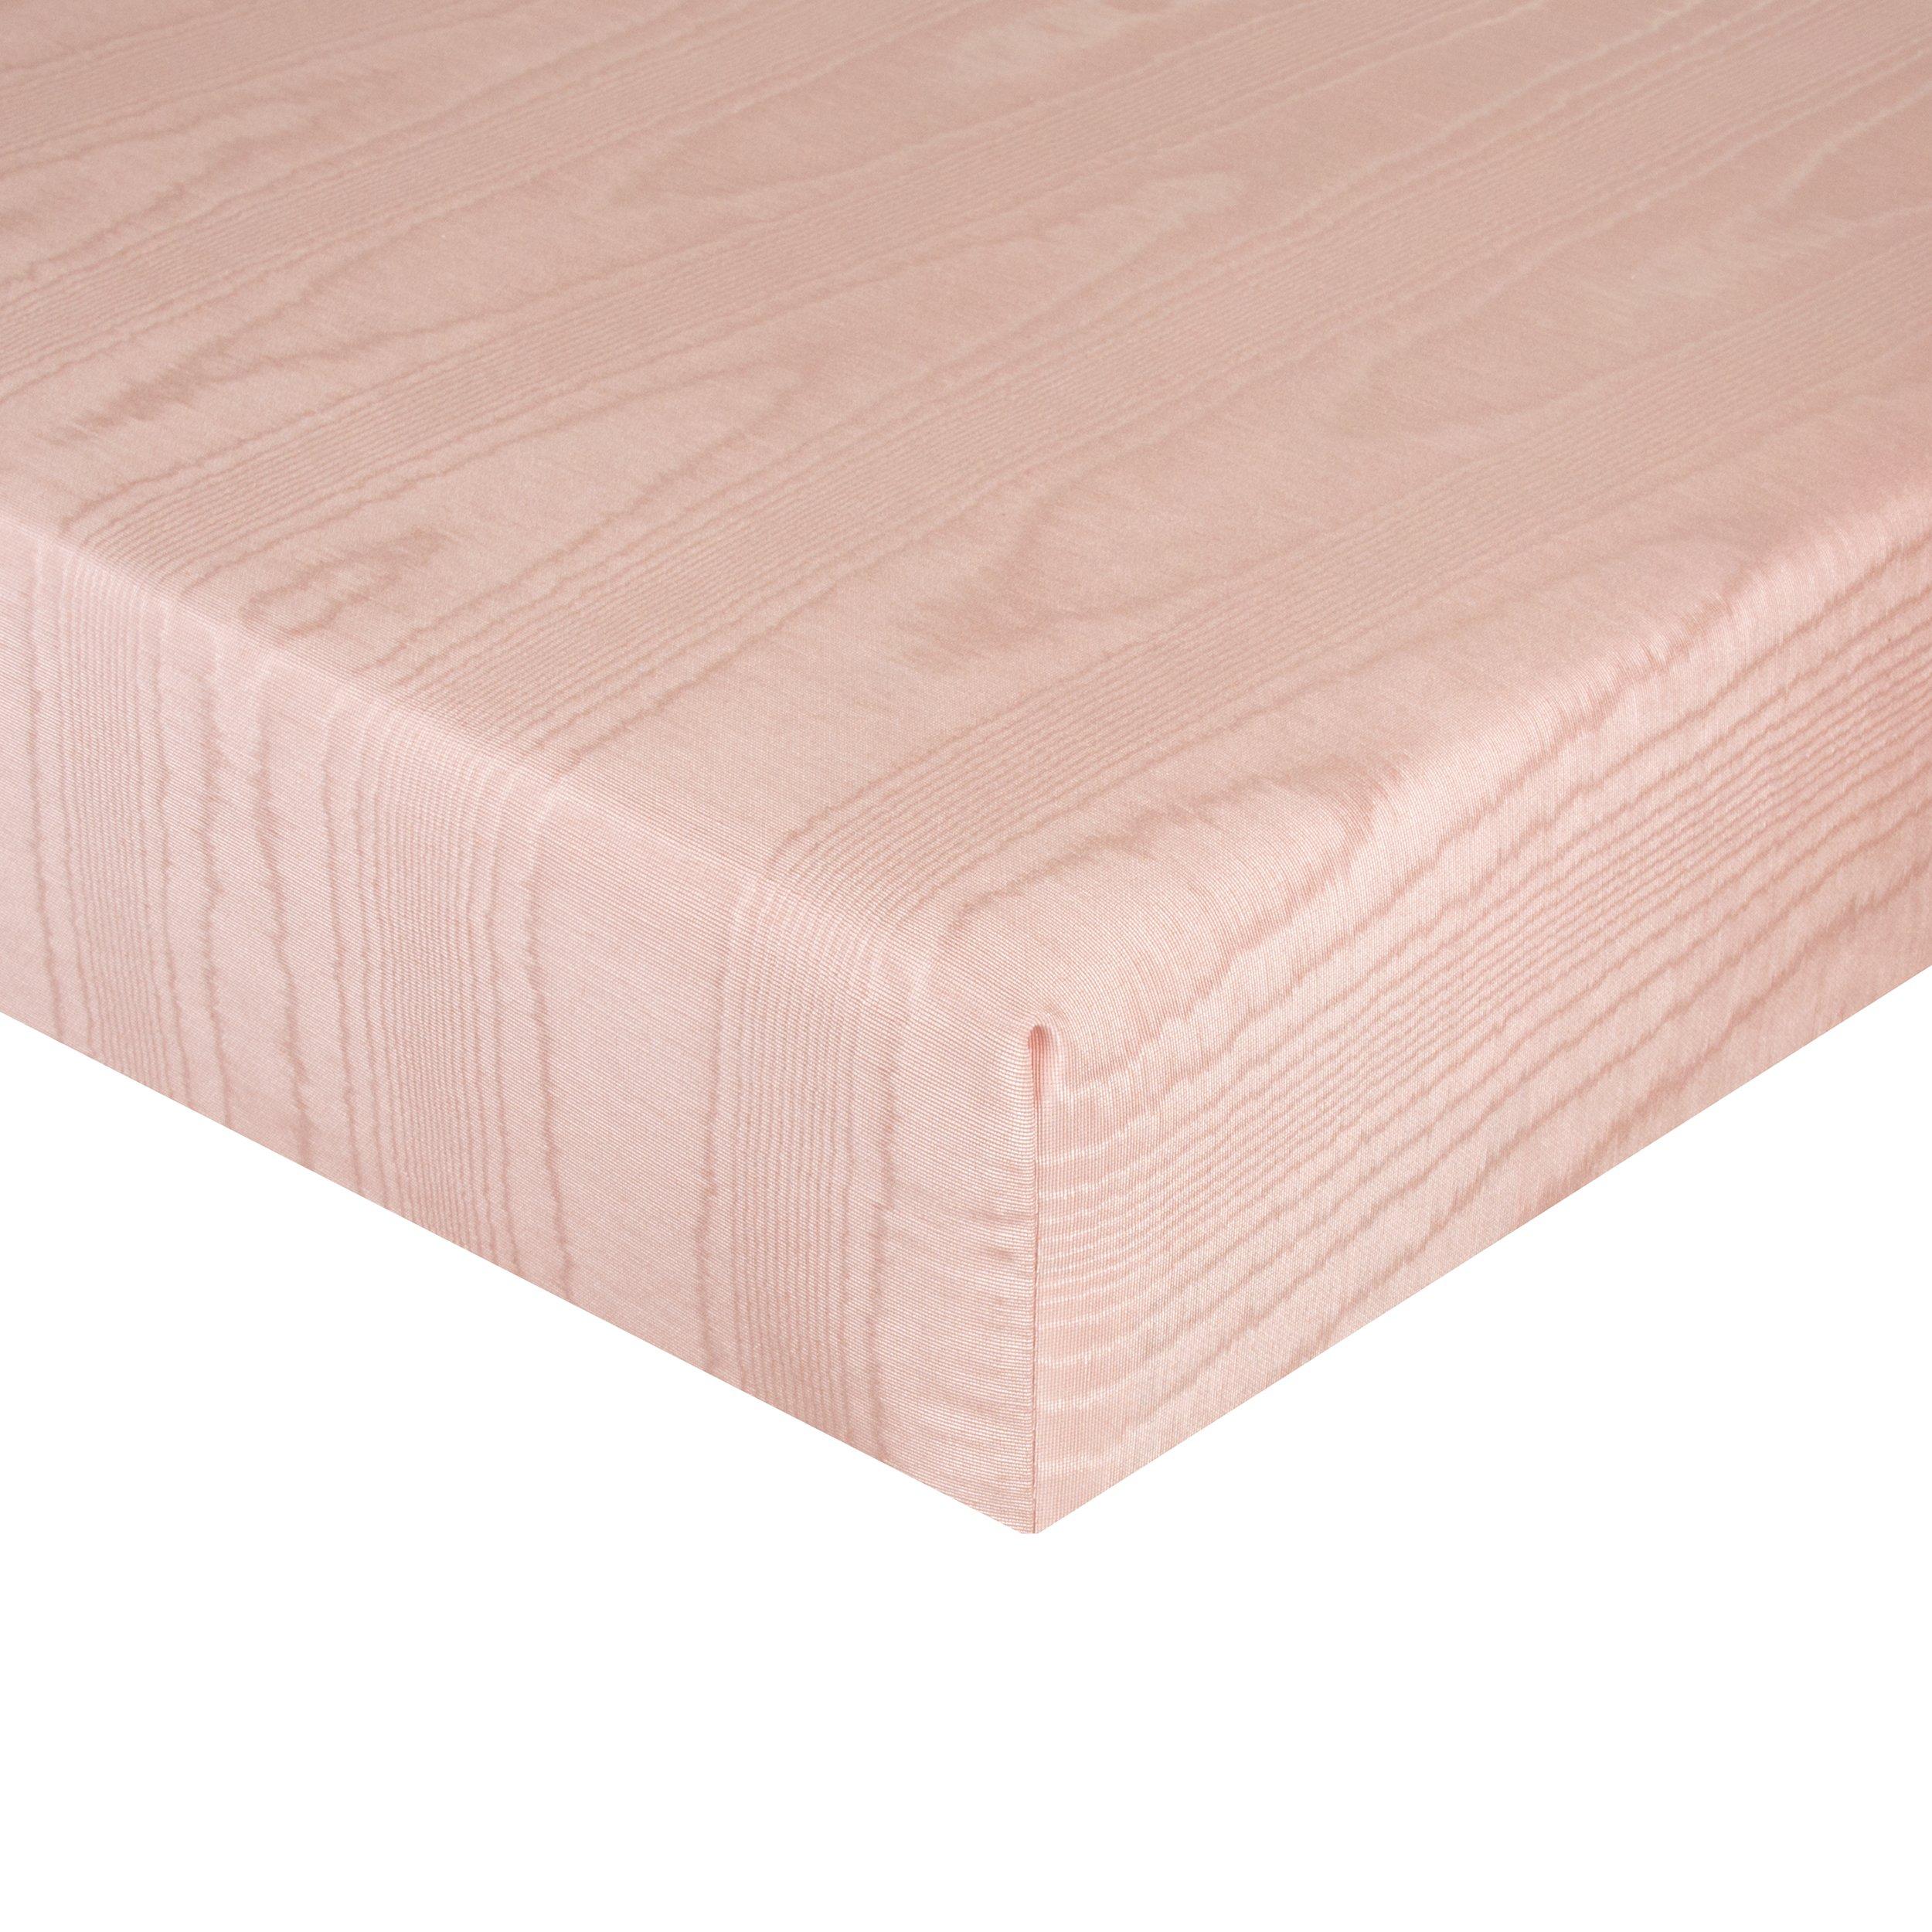 Glenna Jean Remember My Love Mini Crib Fitted Sheet, Pink